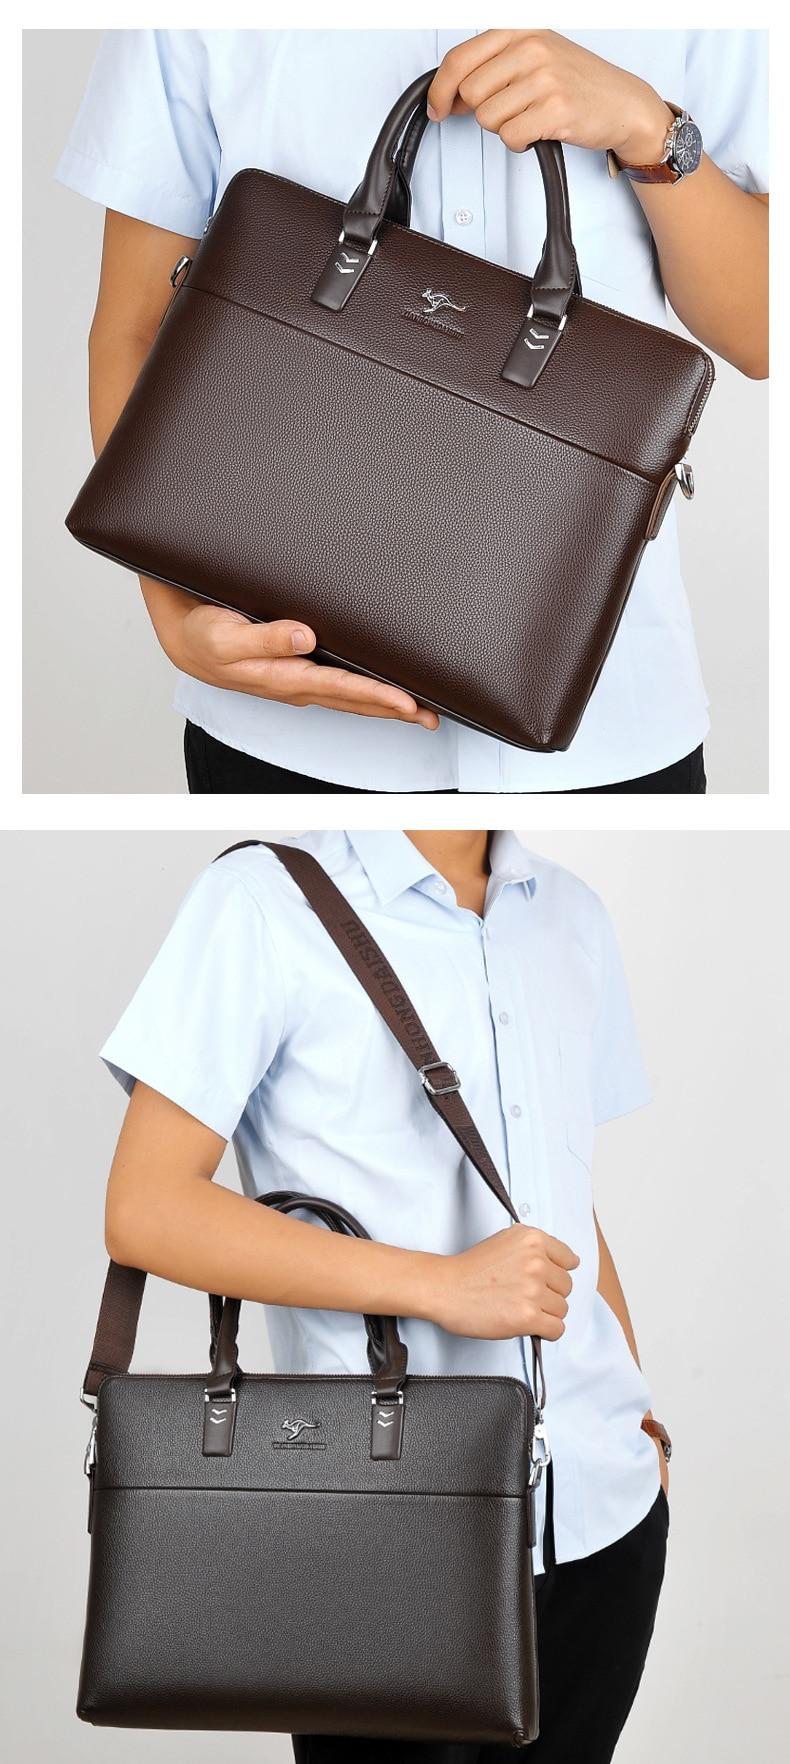 HTB1HuG XfNNTKJjSspeq6ySwpXad TIANHONGDAISHU Men Casual Briefcase Business Shoulder Leather Messenger Bags Computer Laptop Handbag Men's Travel Bags handbags